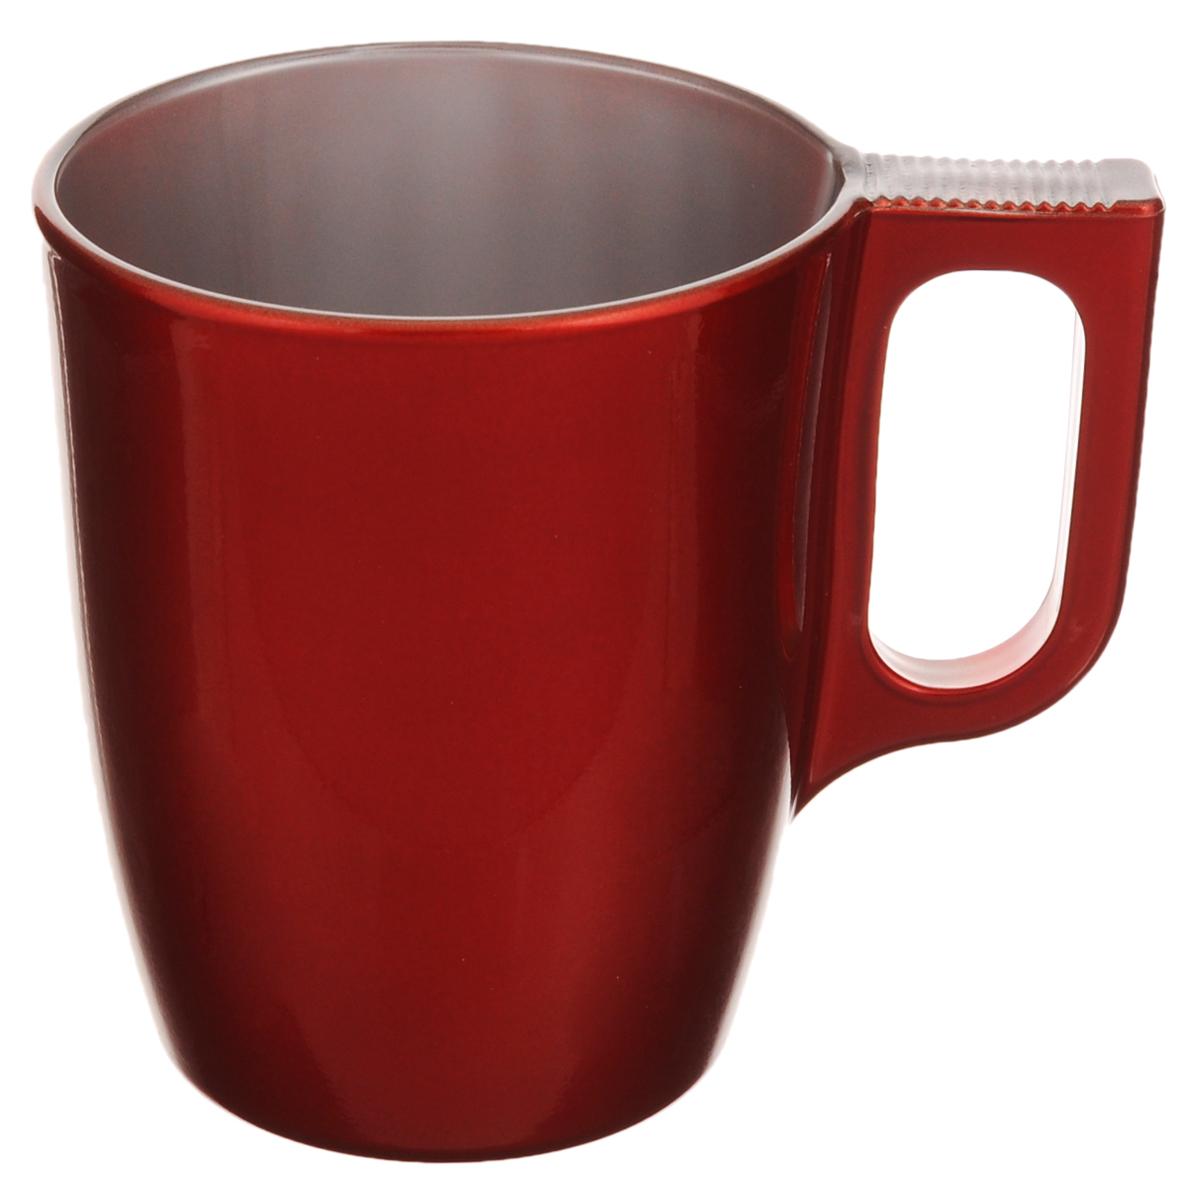 Кружка Luminarc Flashy Colors, цвет: красный, 250 мл цена